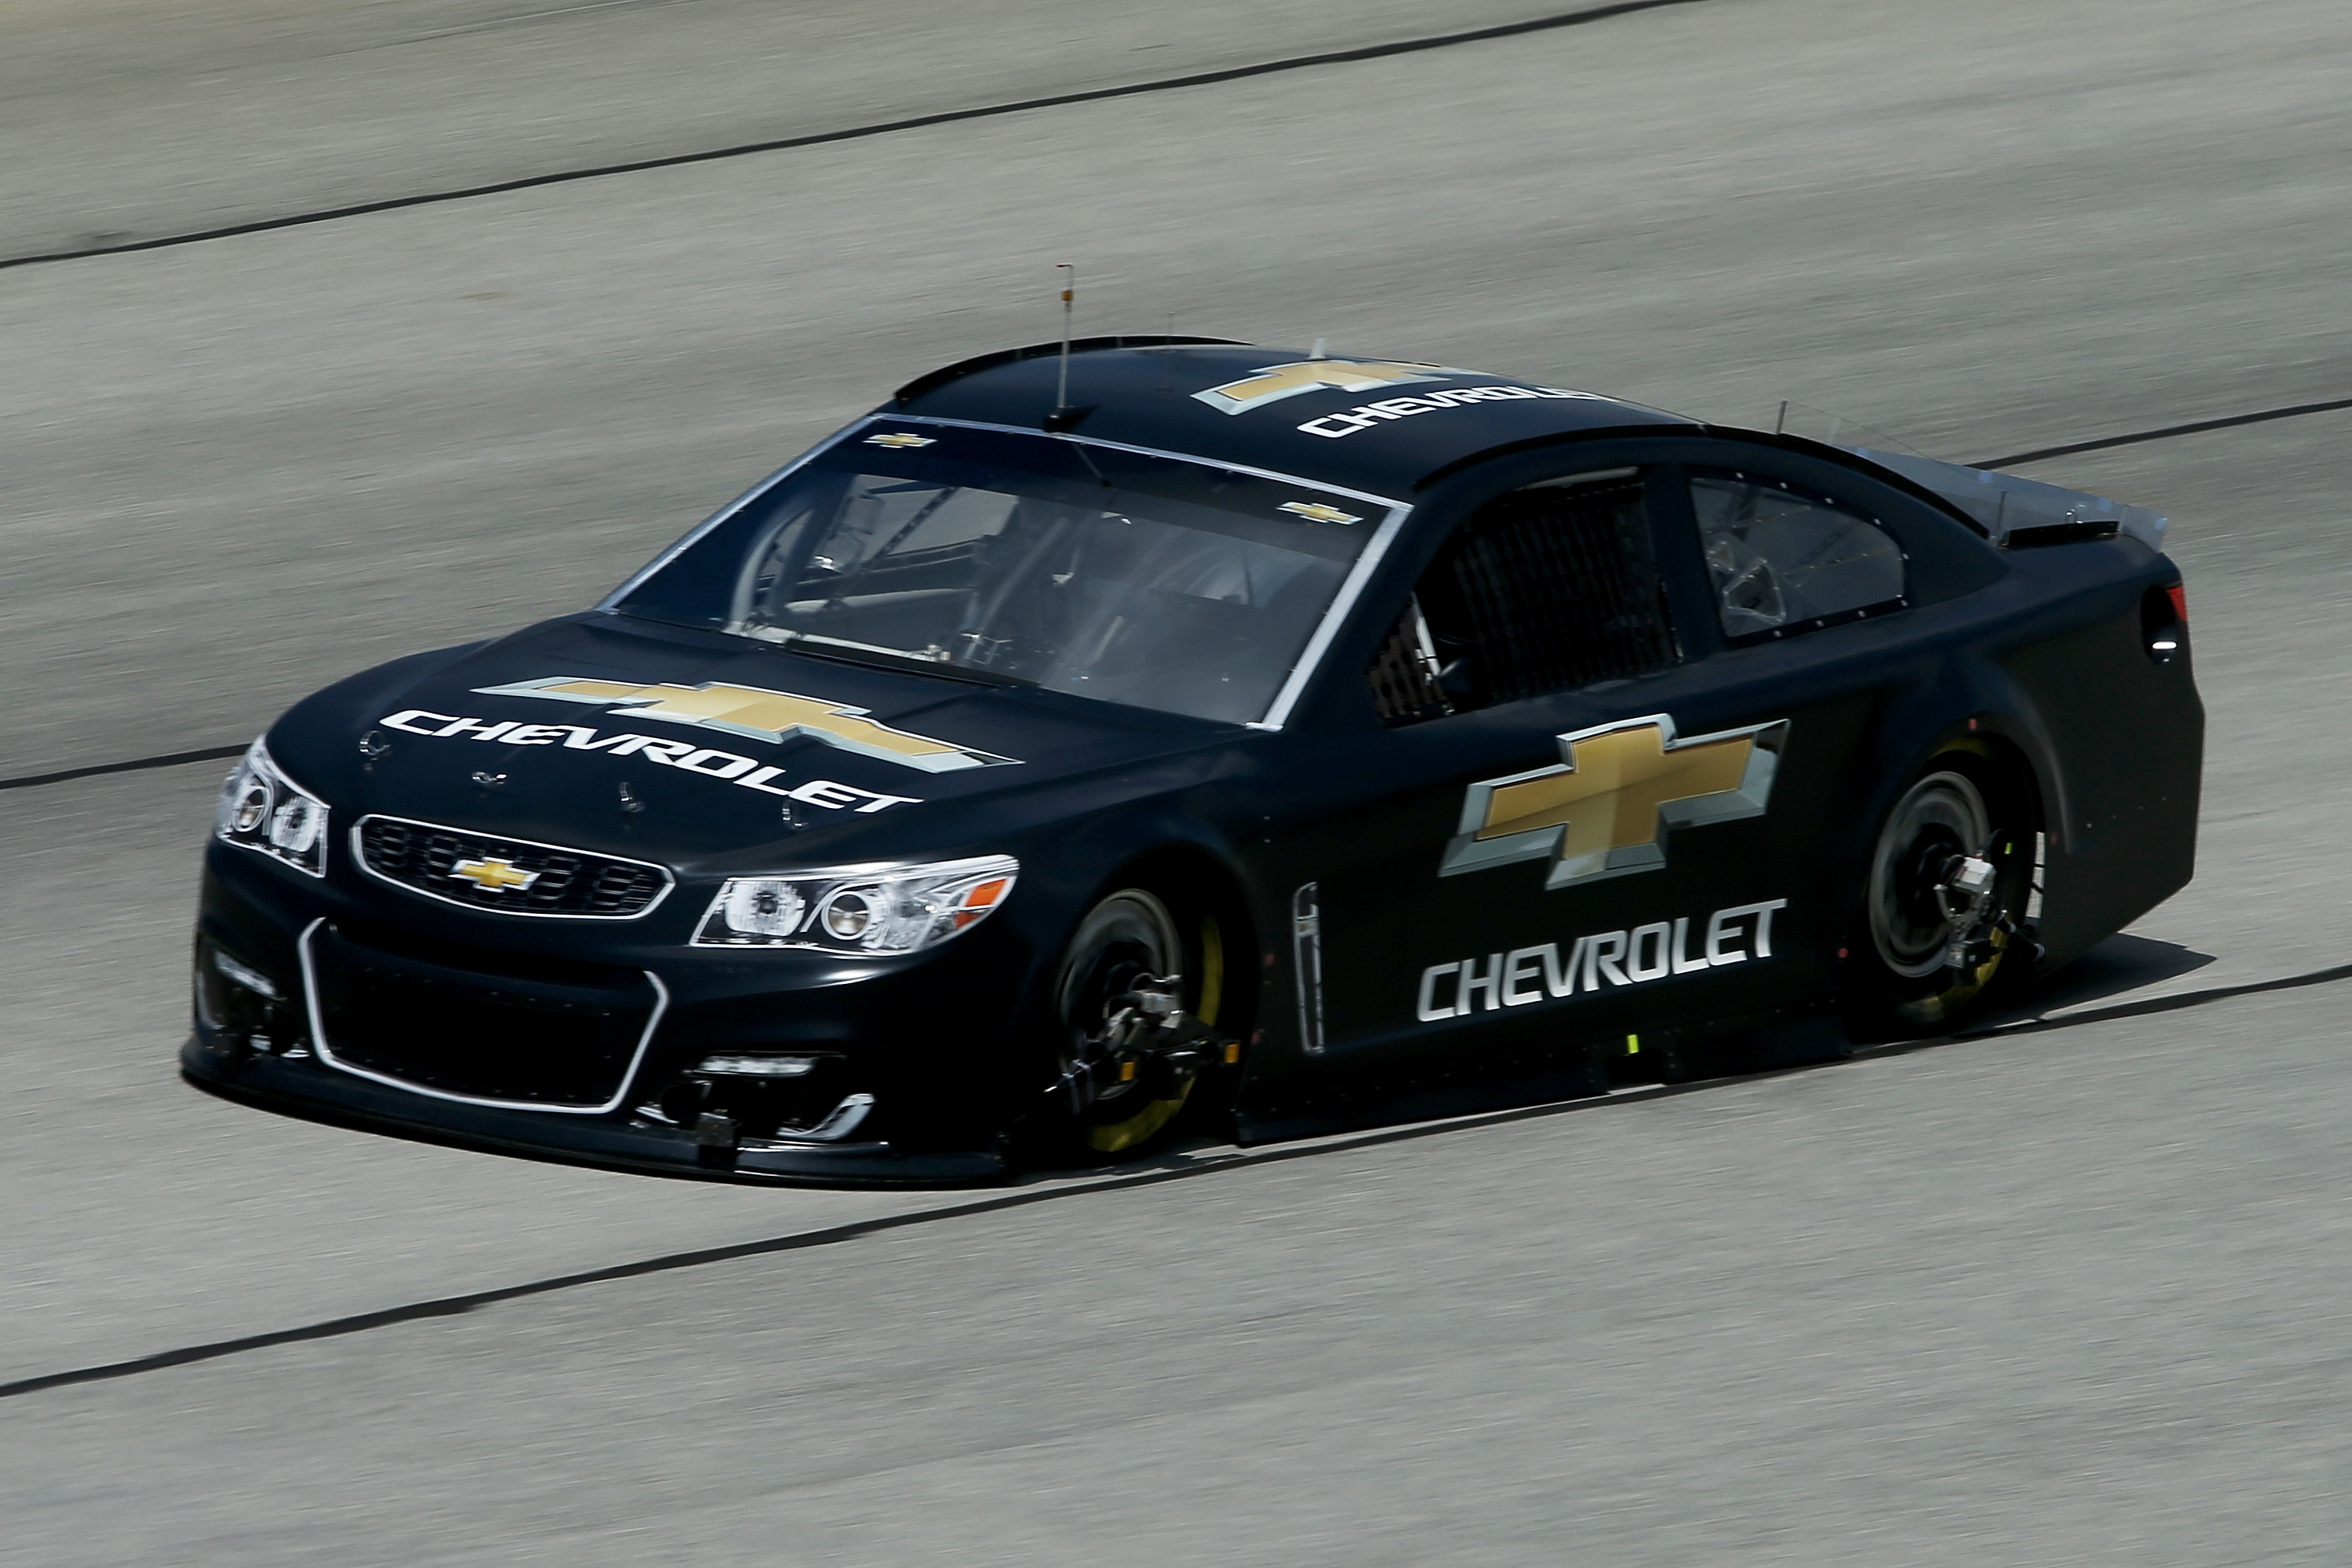 2018 NASCAR Engine Rules Limited